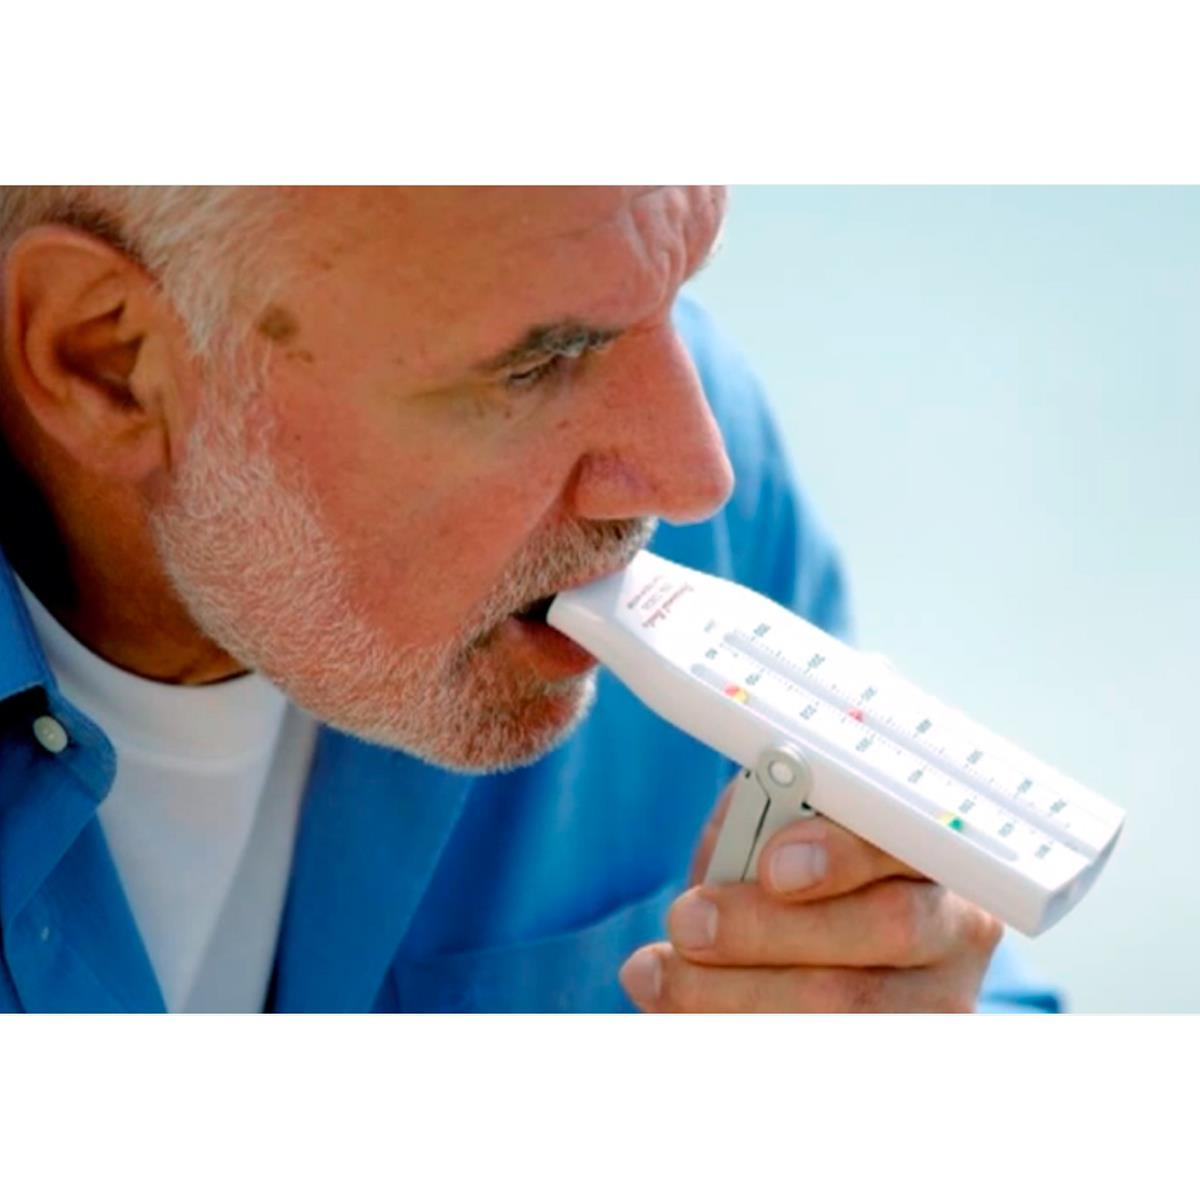 Peak Flow Philips Respironics Medidor De Pico De Fluxo Respiratório Adulto